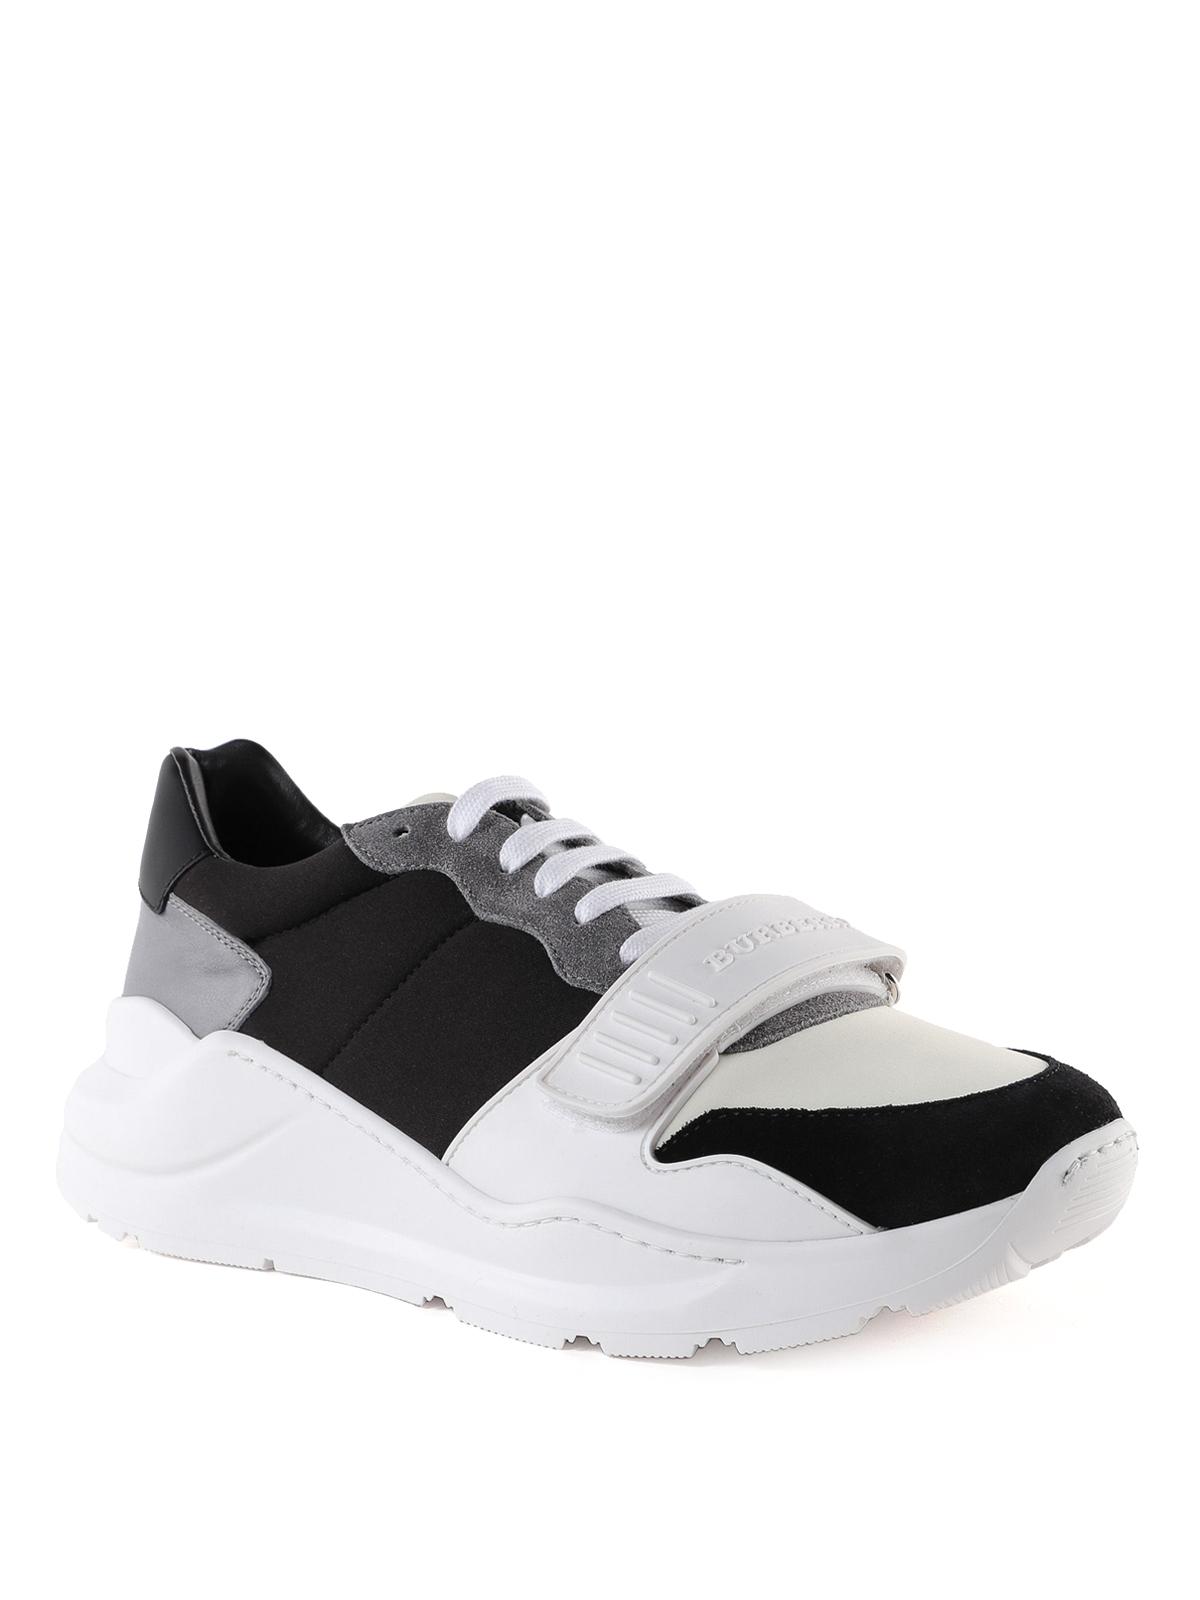 Burberry - Regis sneakers - trainers